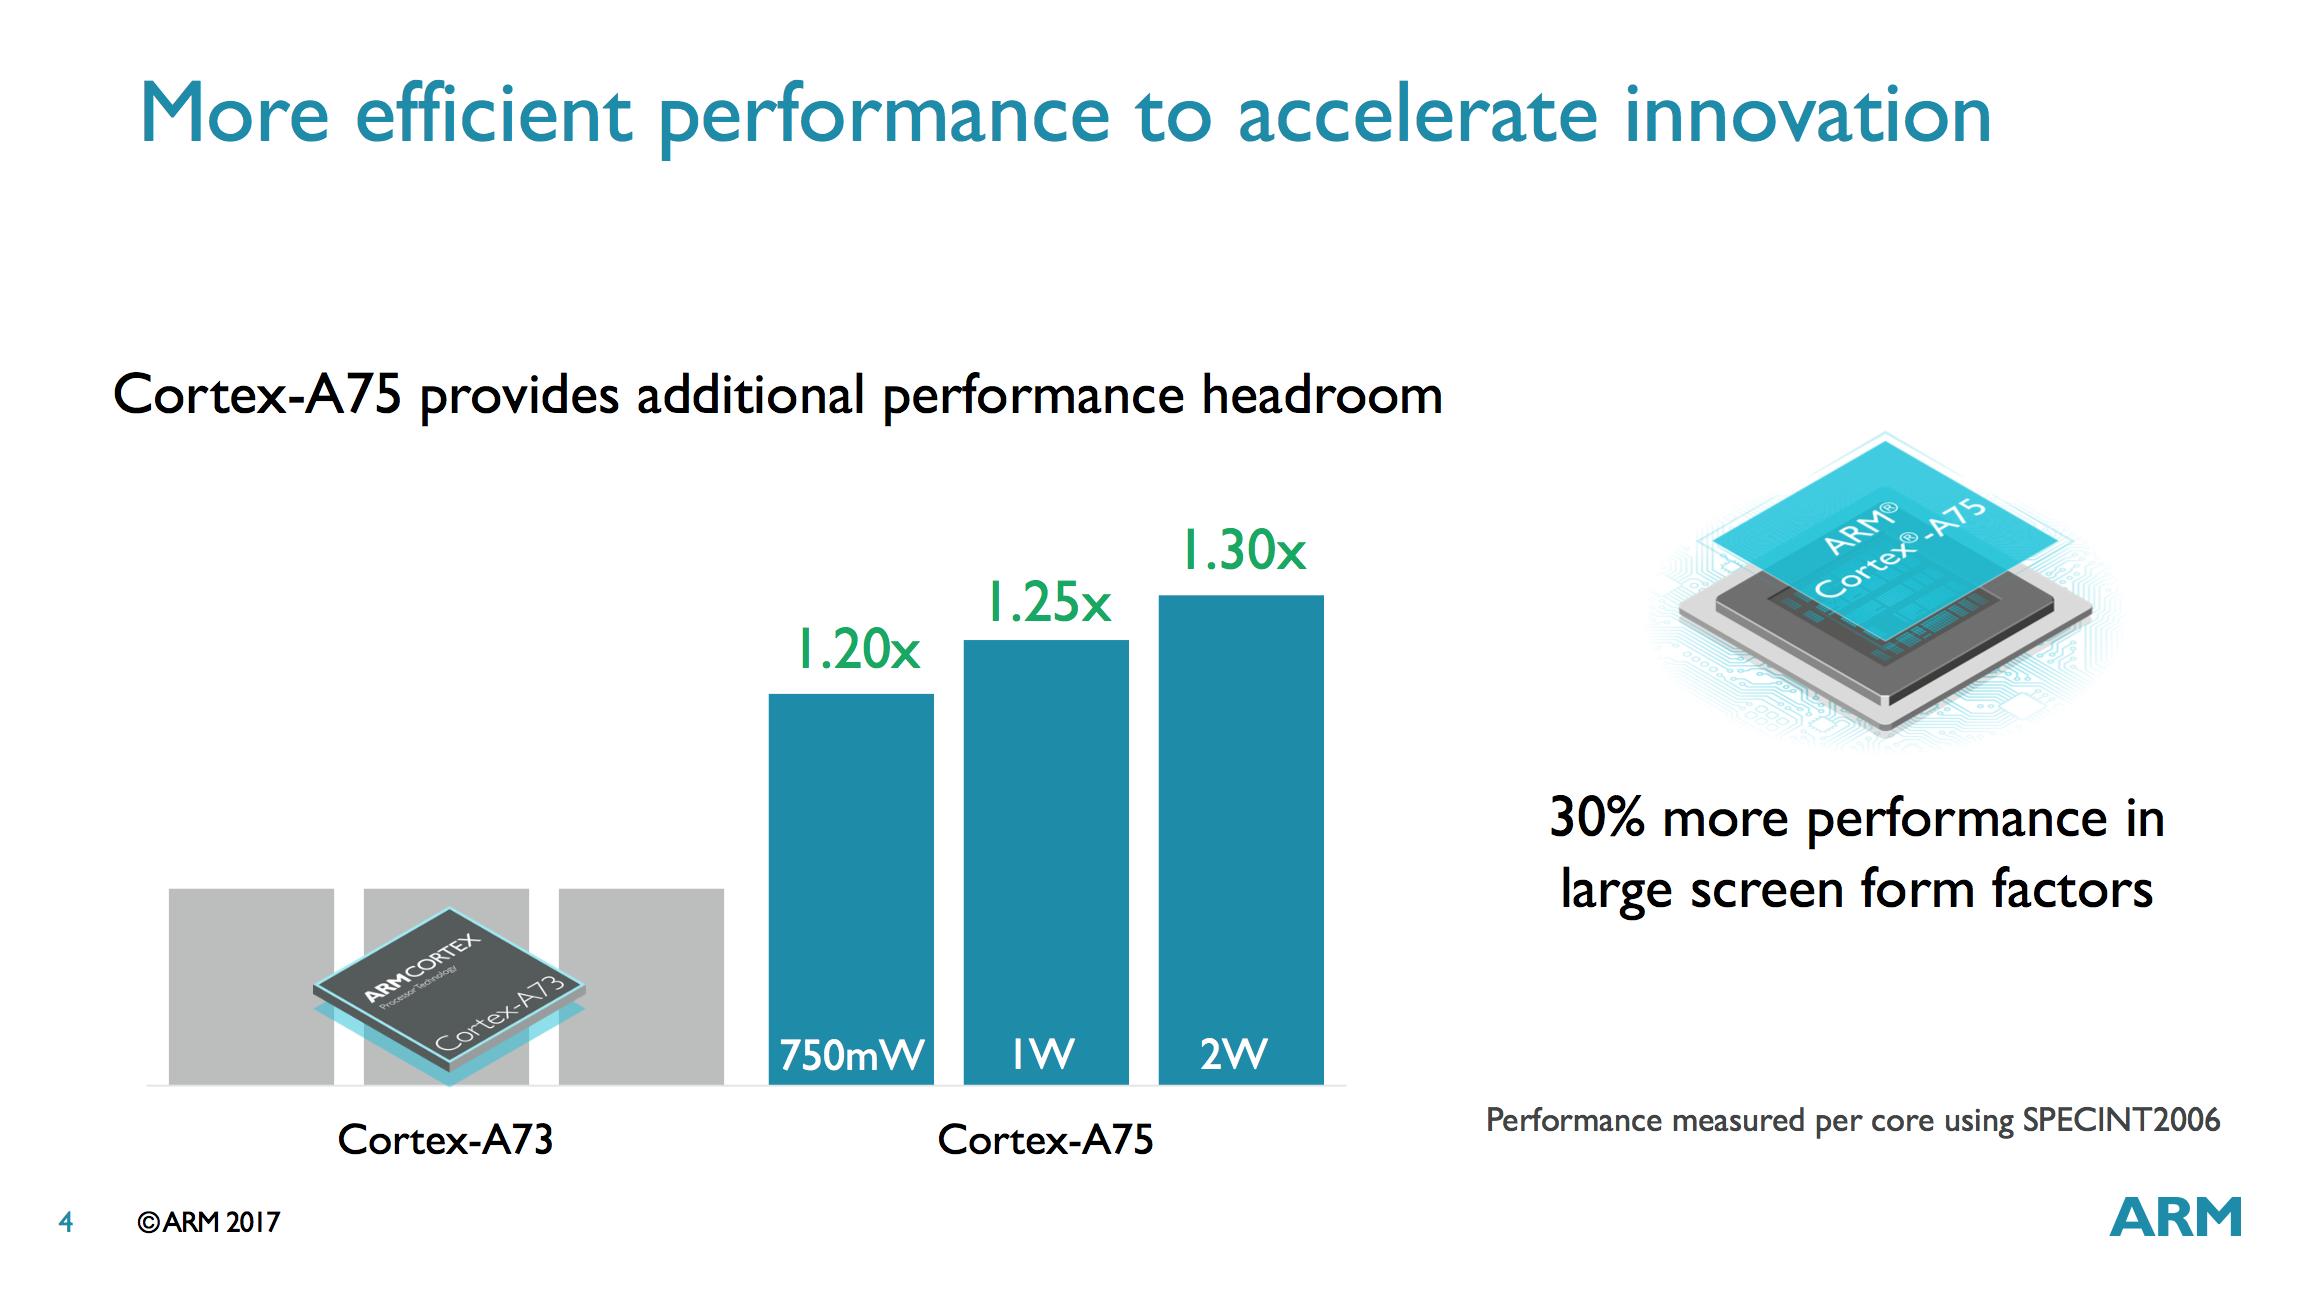 ARM анонсировала новые процессоры Cortex-A75, A55 и Mali-G72 - 4